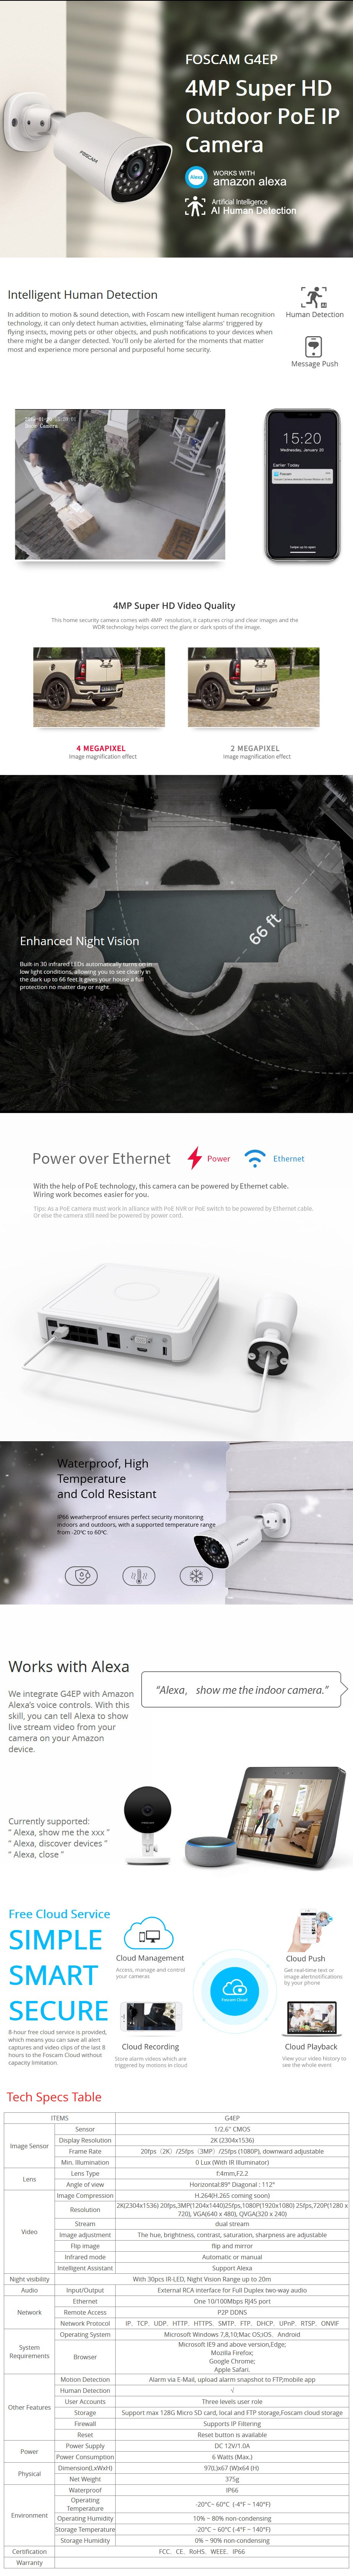 foscam-g4ep-4mp-wireless-outdoor-poe-ip-camera-ac26867-6.jpg